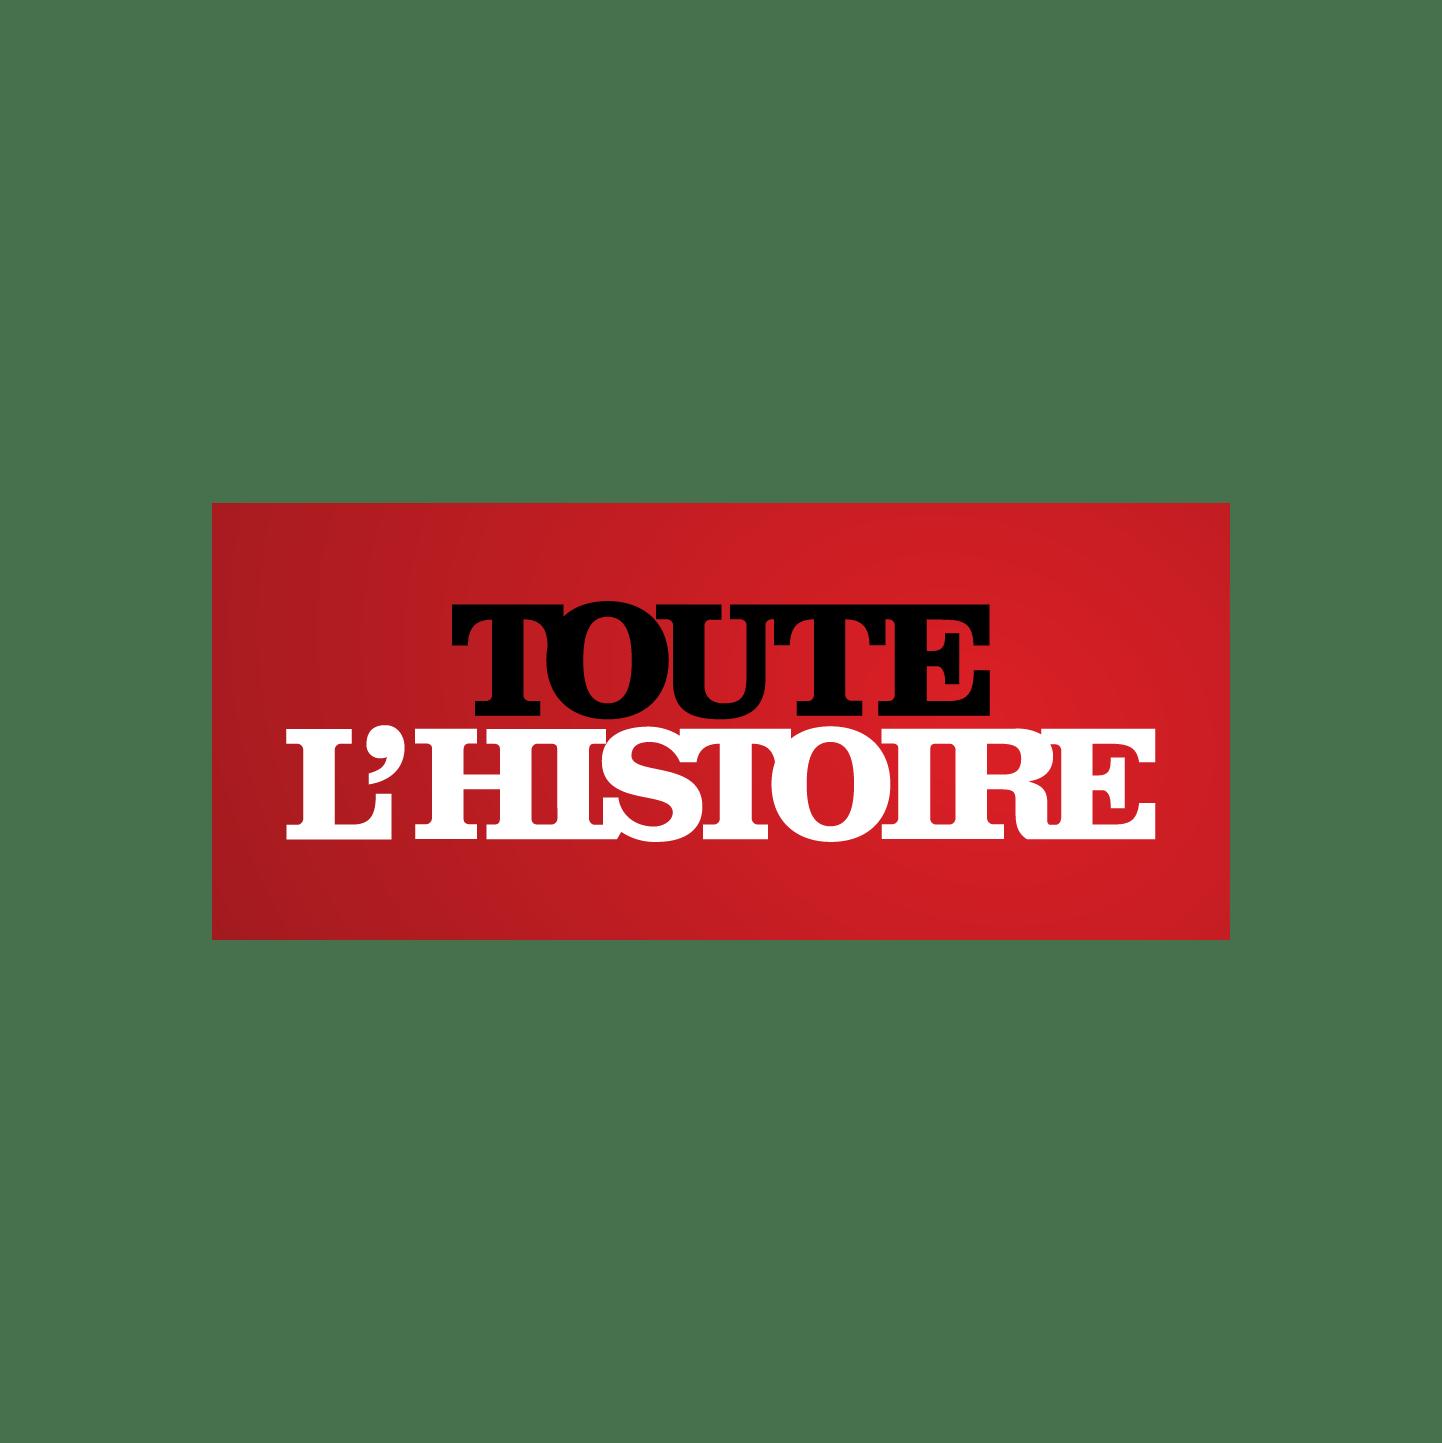 Logo Toute Ll'Histoire